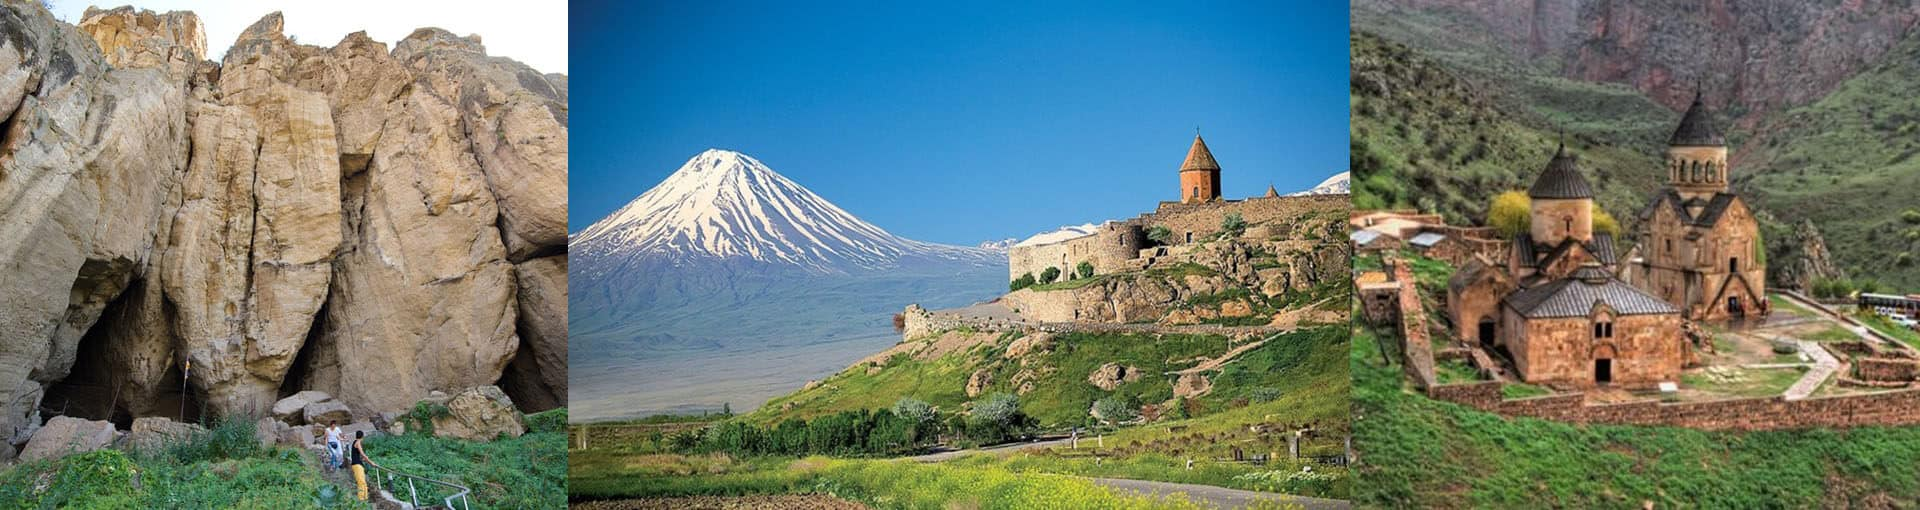 Знакомство с Арменией: с Хор Вирапа до Нораванка